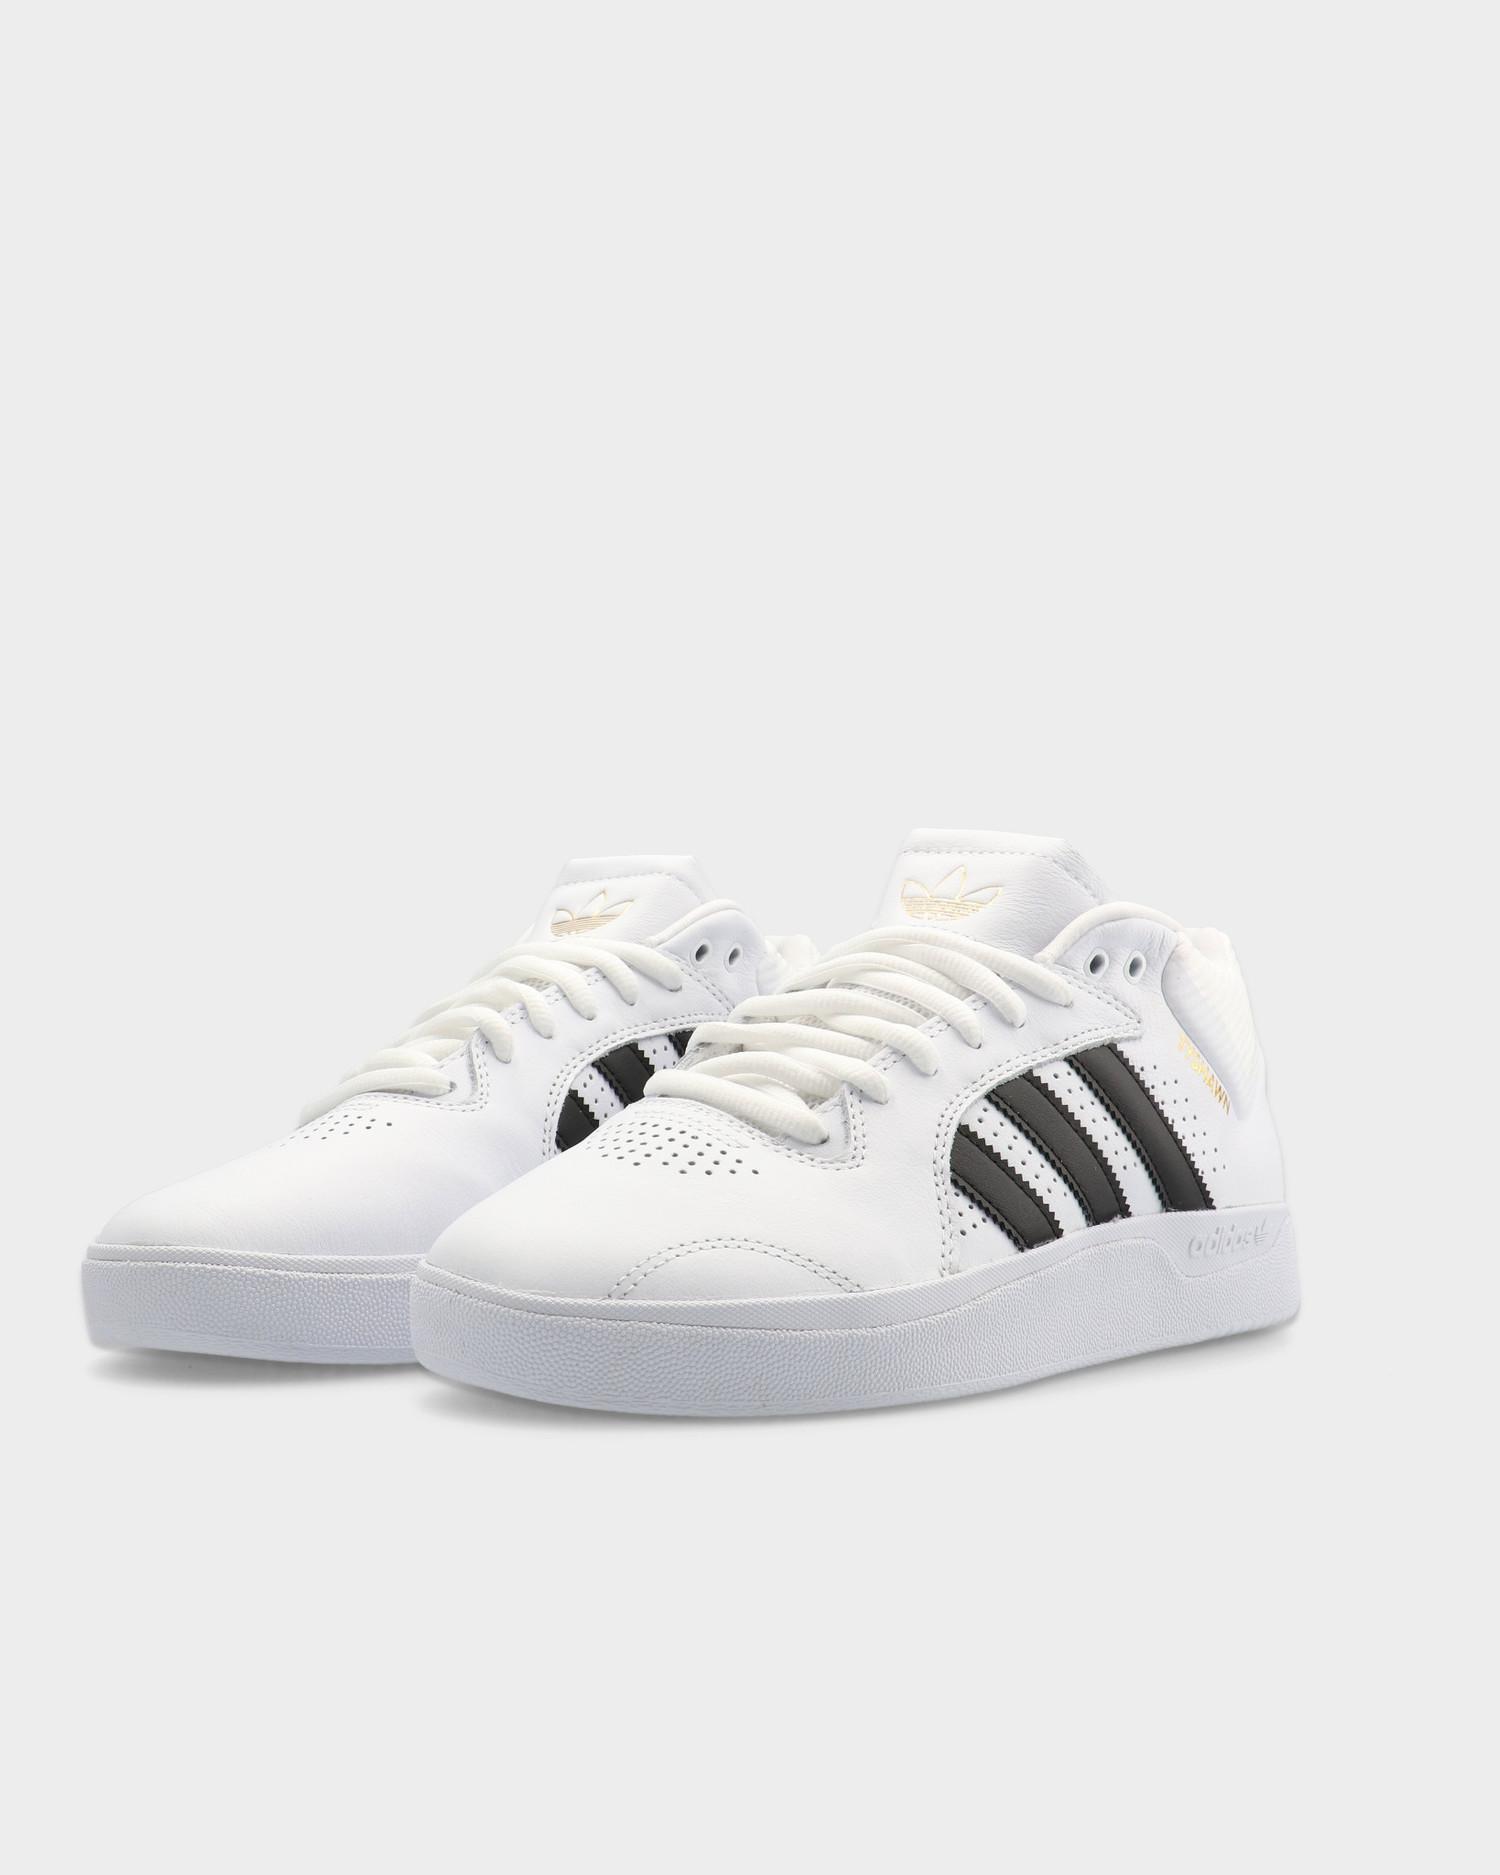 Adidas Tyshawn Footwear White/Black/Footwear White